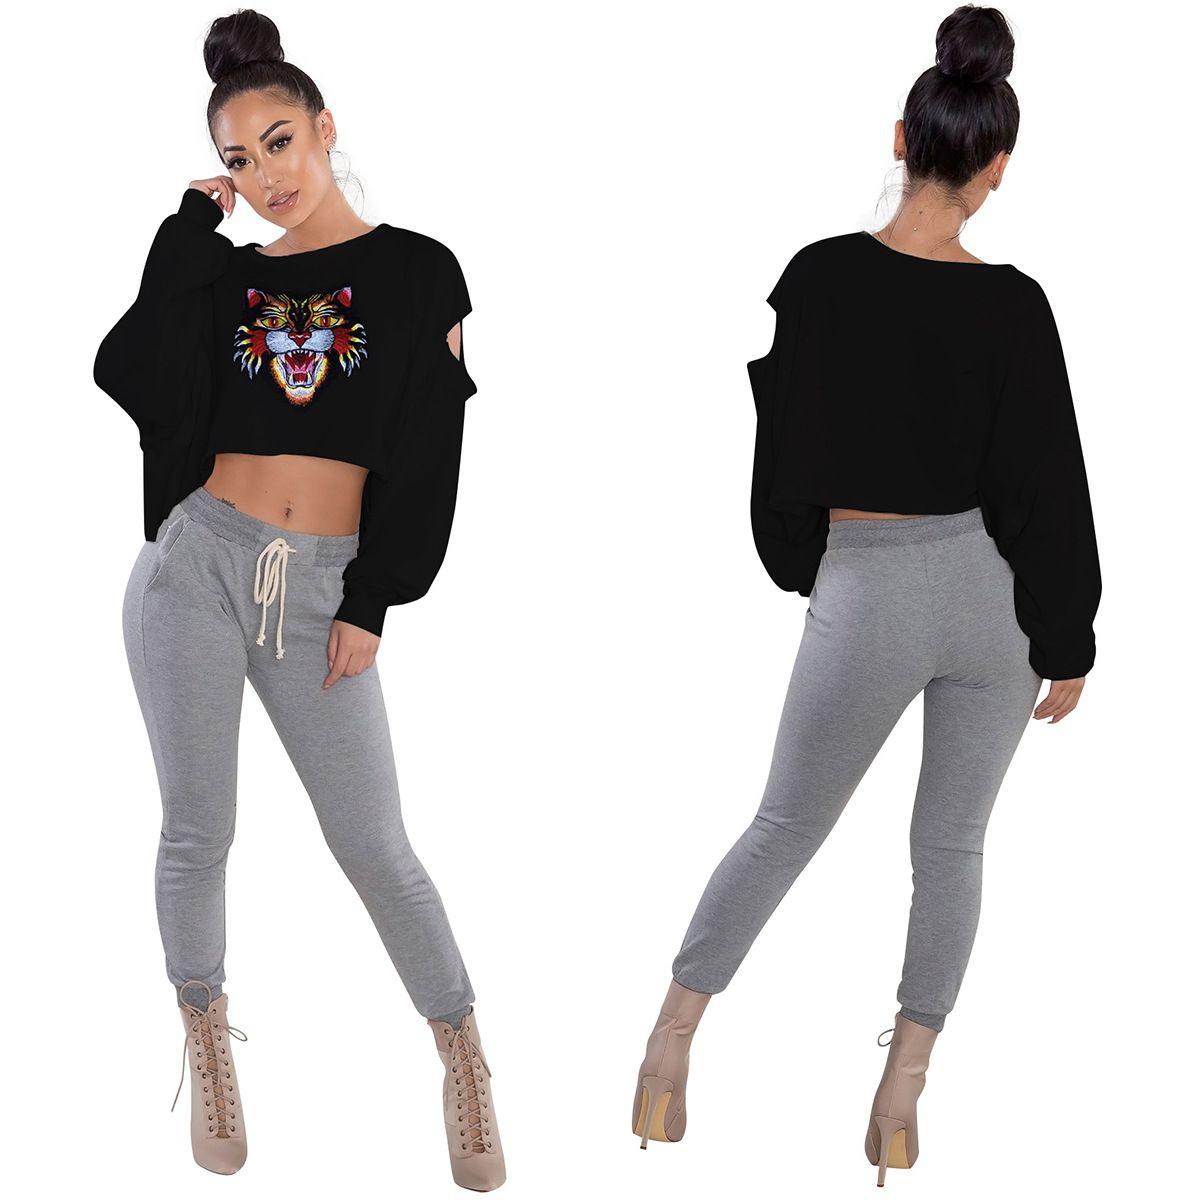 Tiger Head Crop Top T Shirts Printed Women Long Sleeve Round Neck Short Pullover Tee Shirts 7 Styles FFA168 50PCS